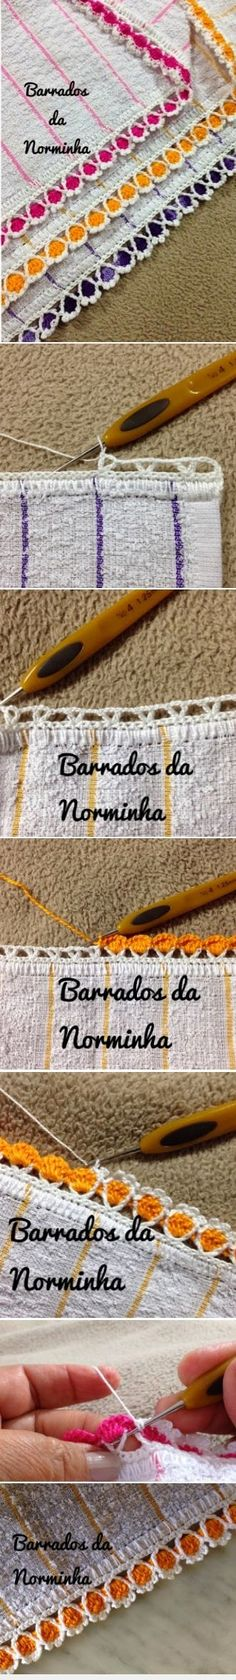 A multicoloured cotton thread trim for teacloths